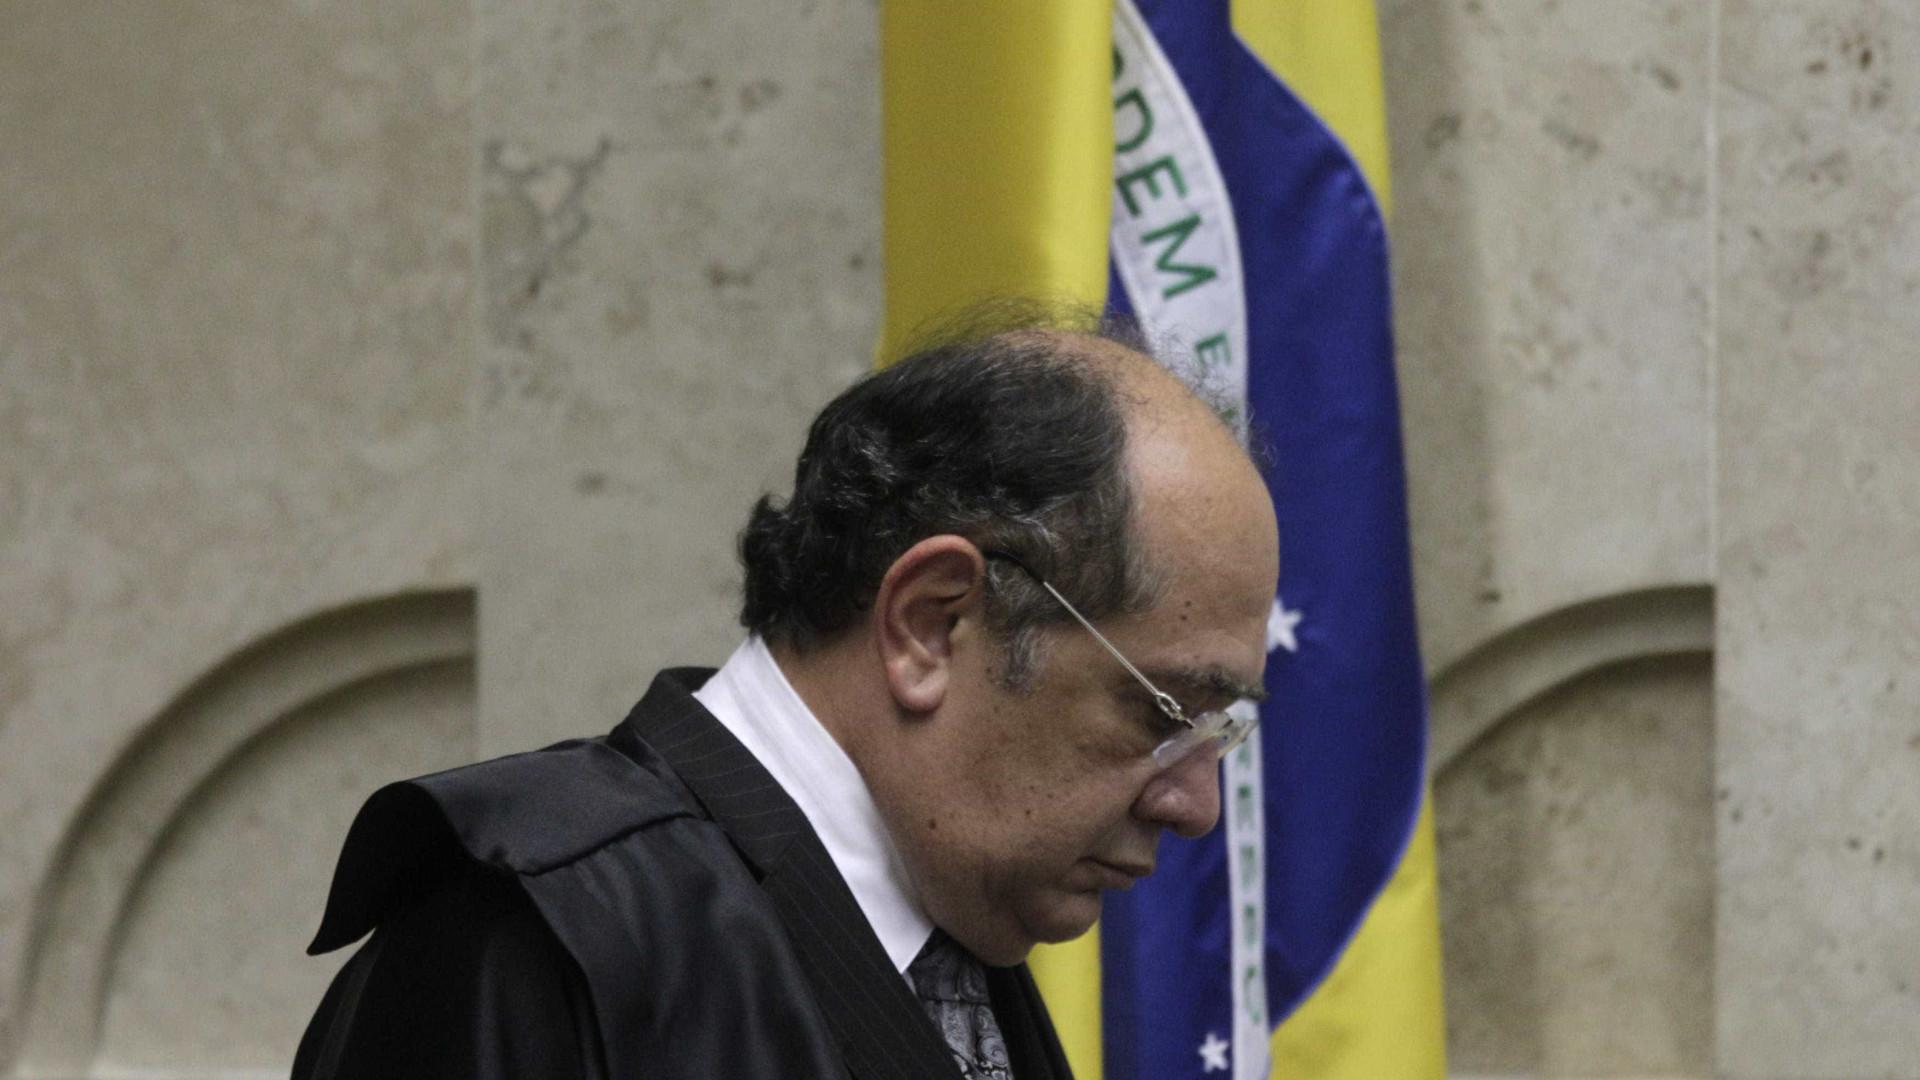 Gilmar Mendes minimiza crise de Temer e diz Lava Jato não é surpresa